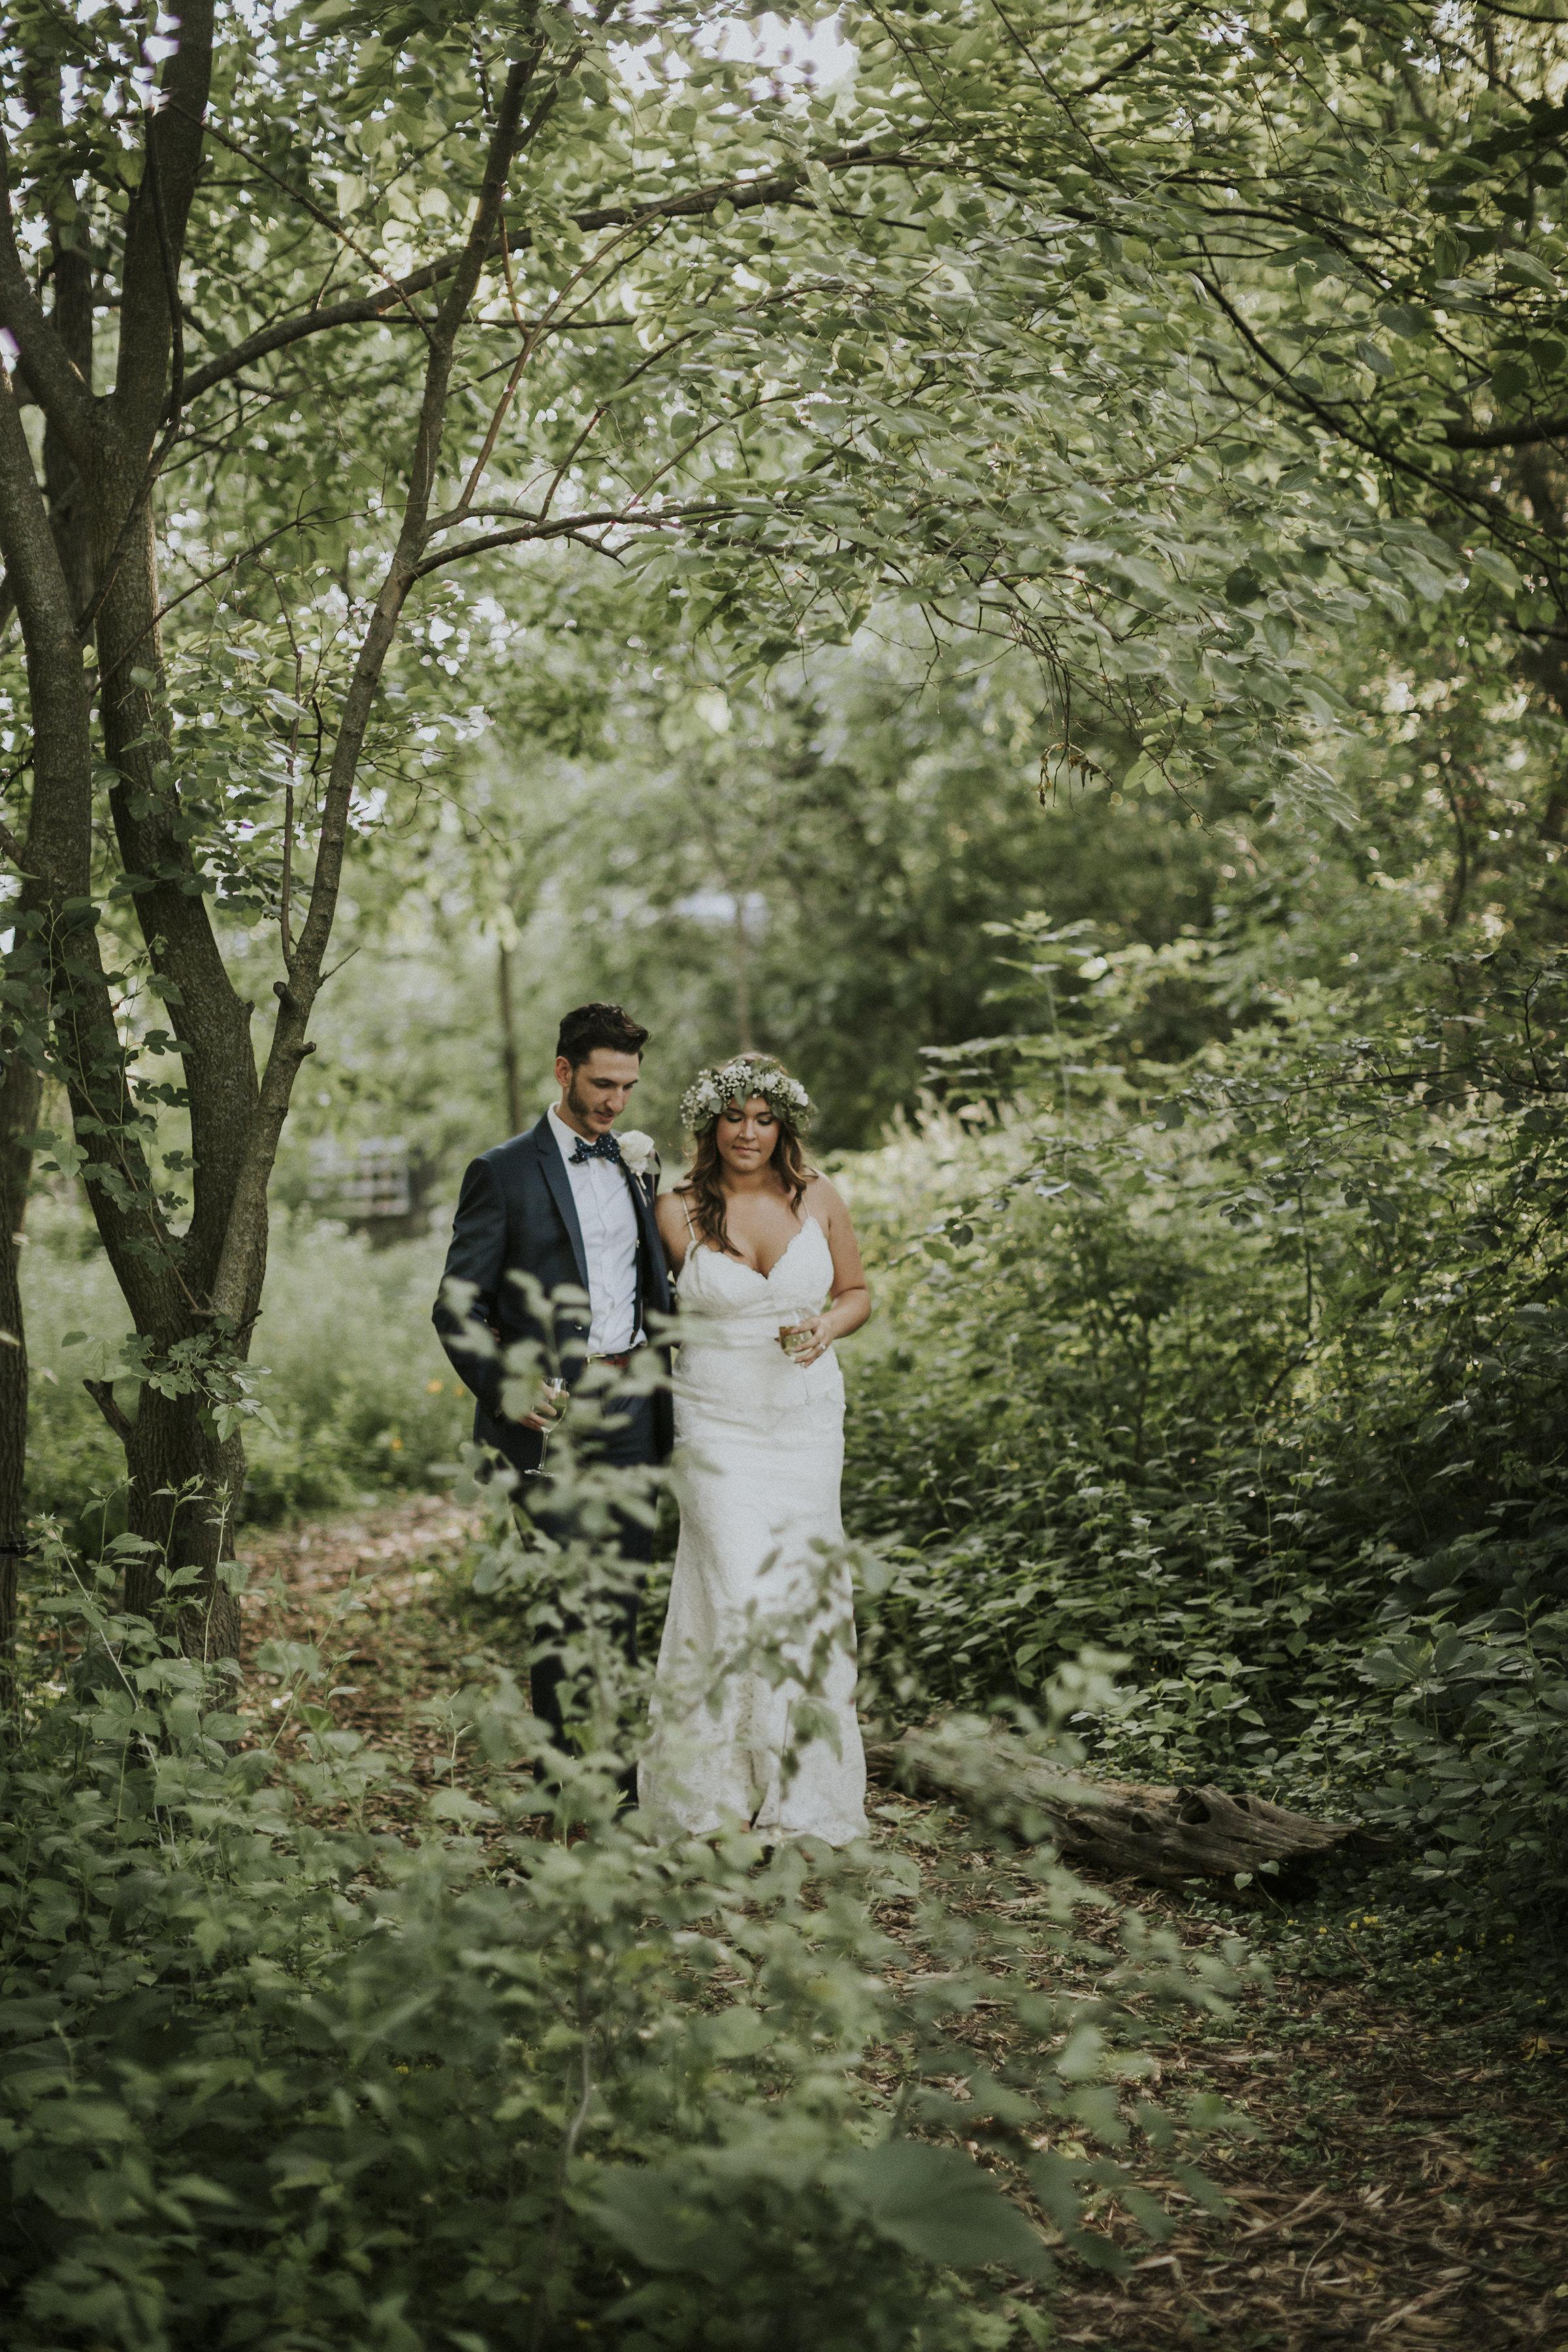 Courtney+Lawrence_Wedding_628.jpg